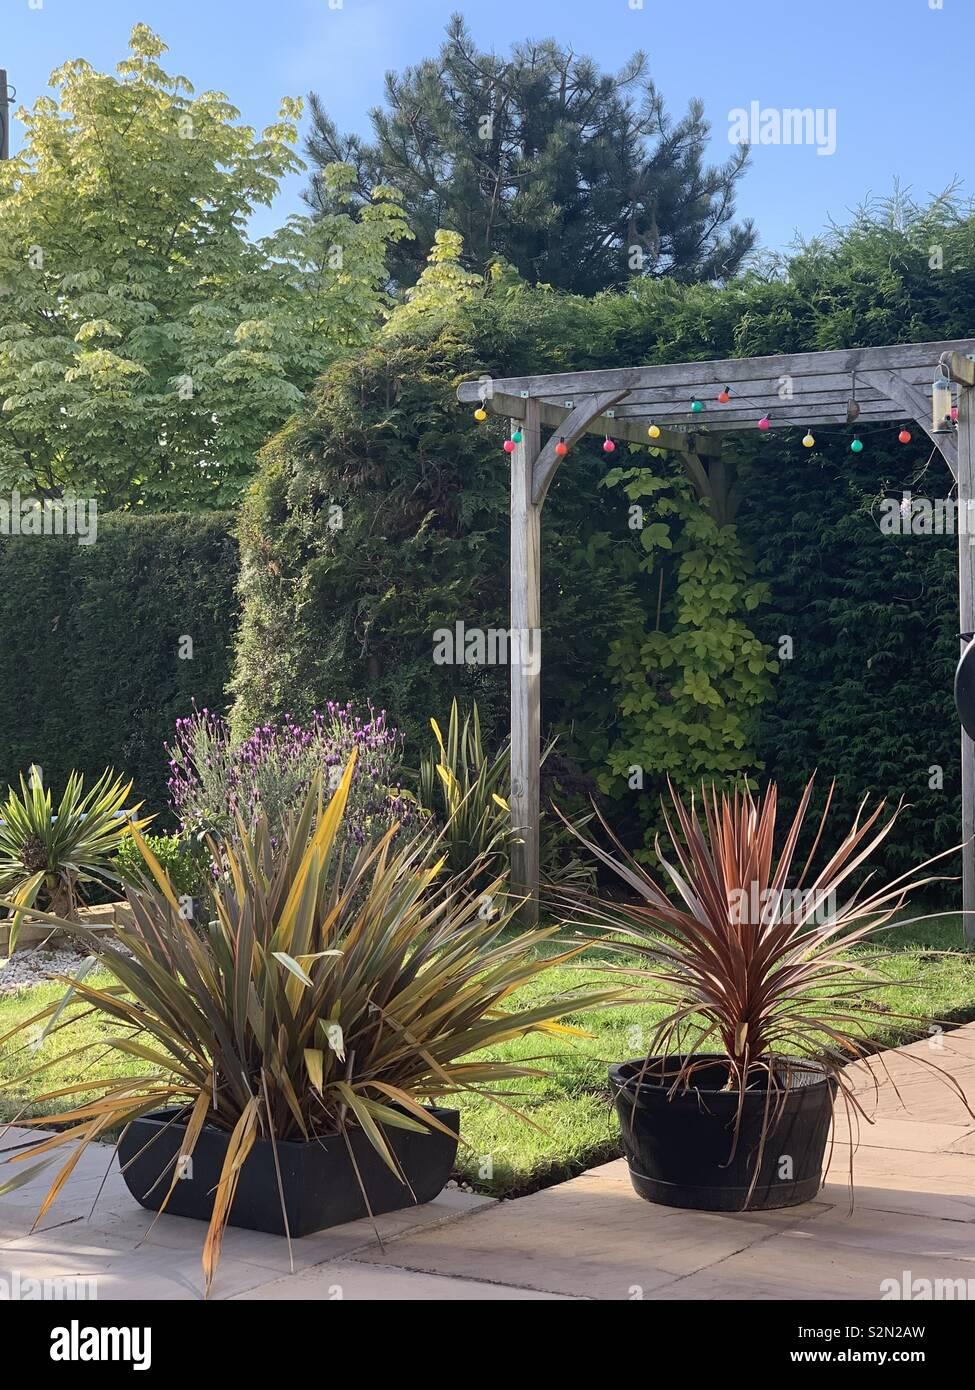 Garden with pergola - Stock Image